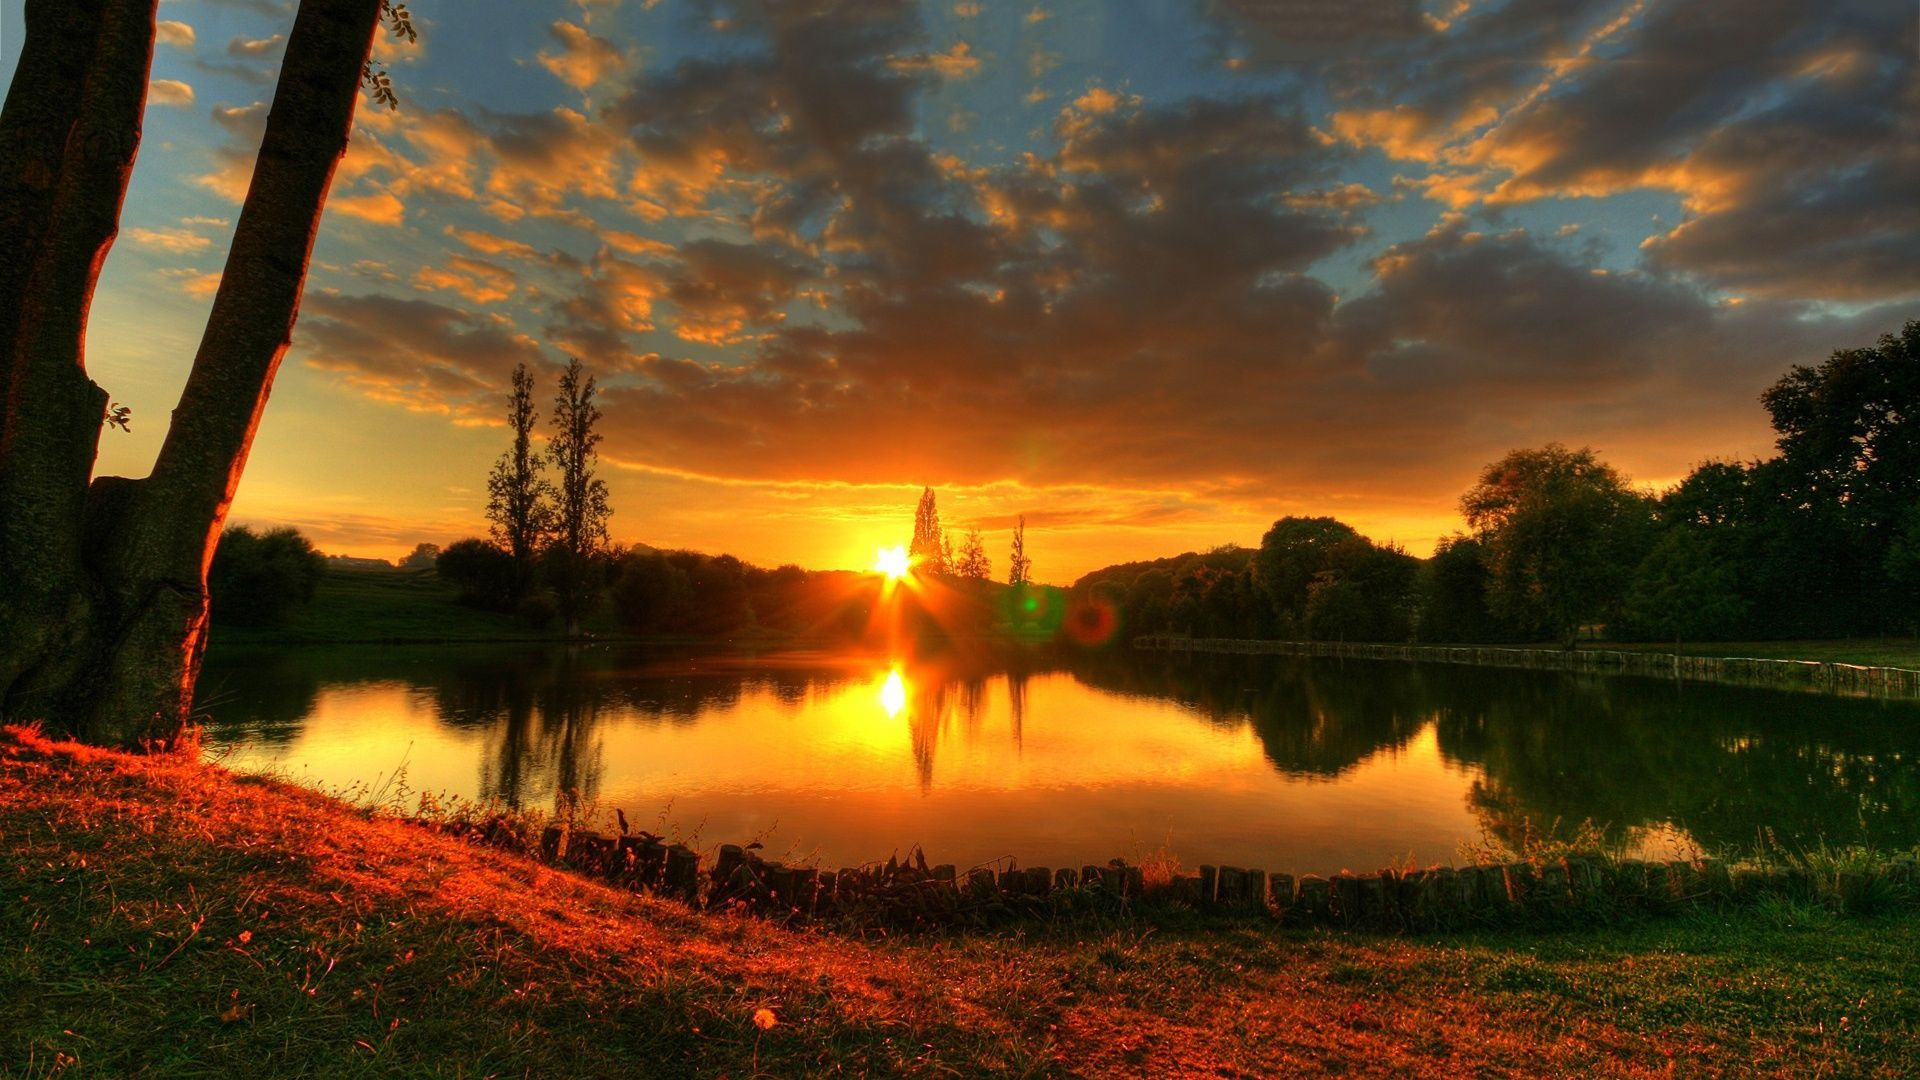 Kaibab Lake Sunset Wallpapers in jpg format for free download